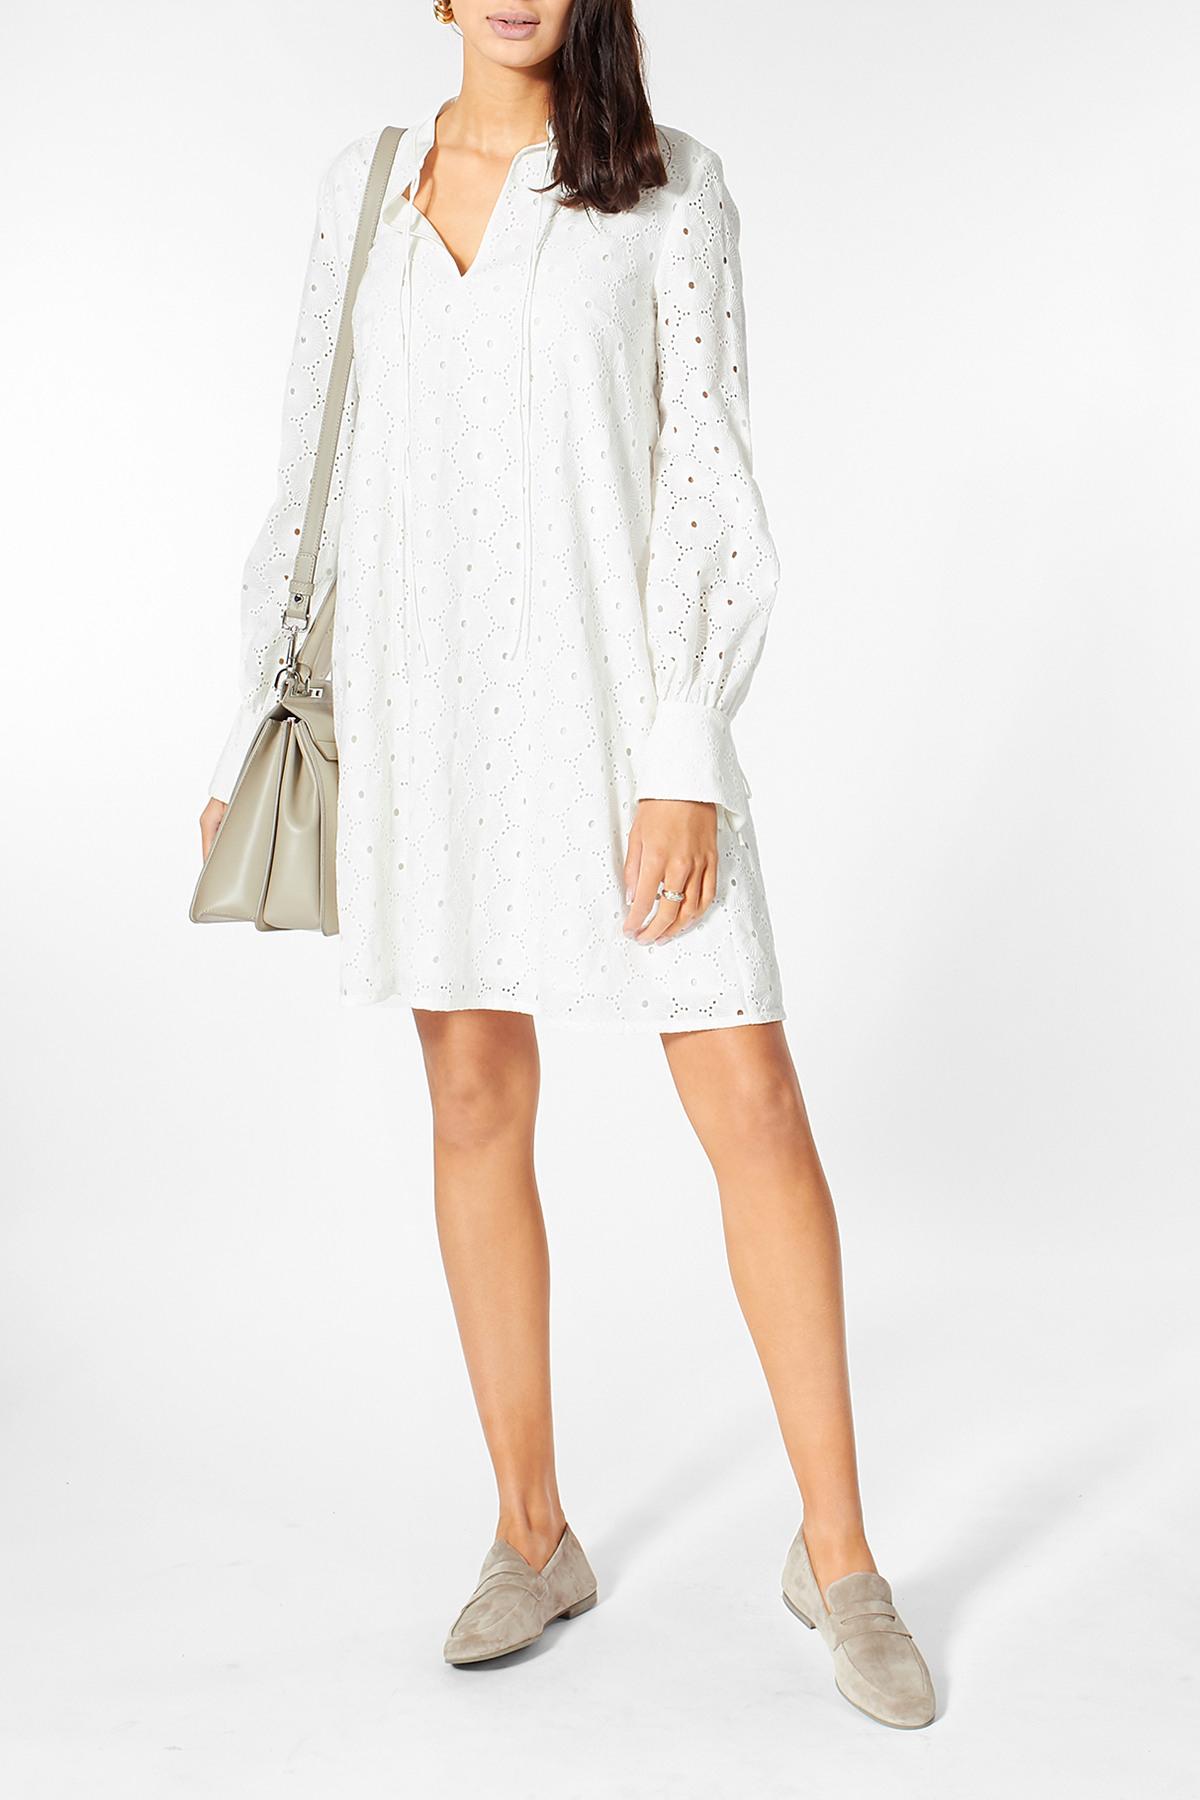 Kleid Mit Lochstickerei  Sly010  Myclassico